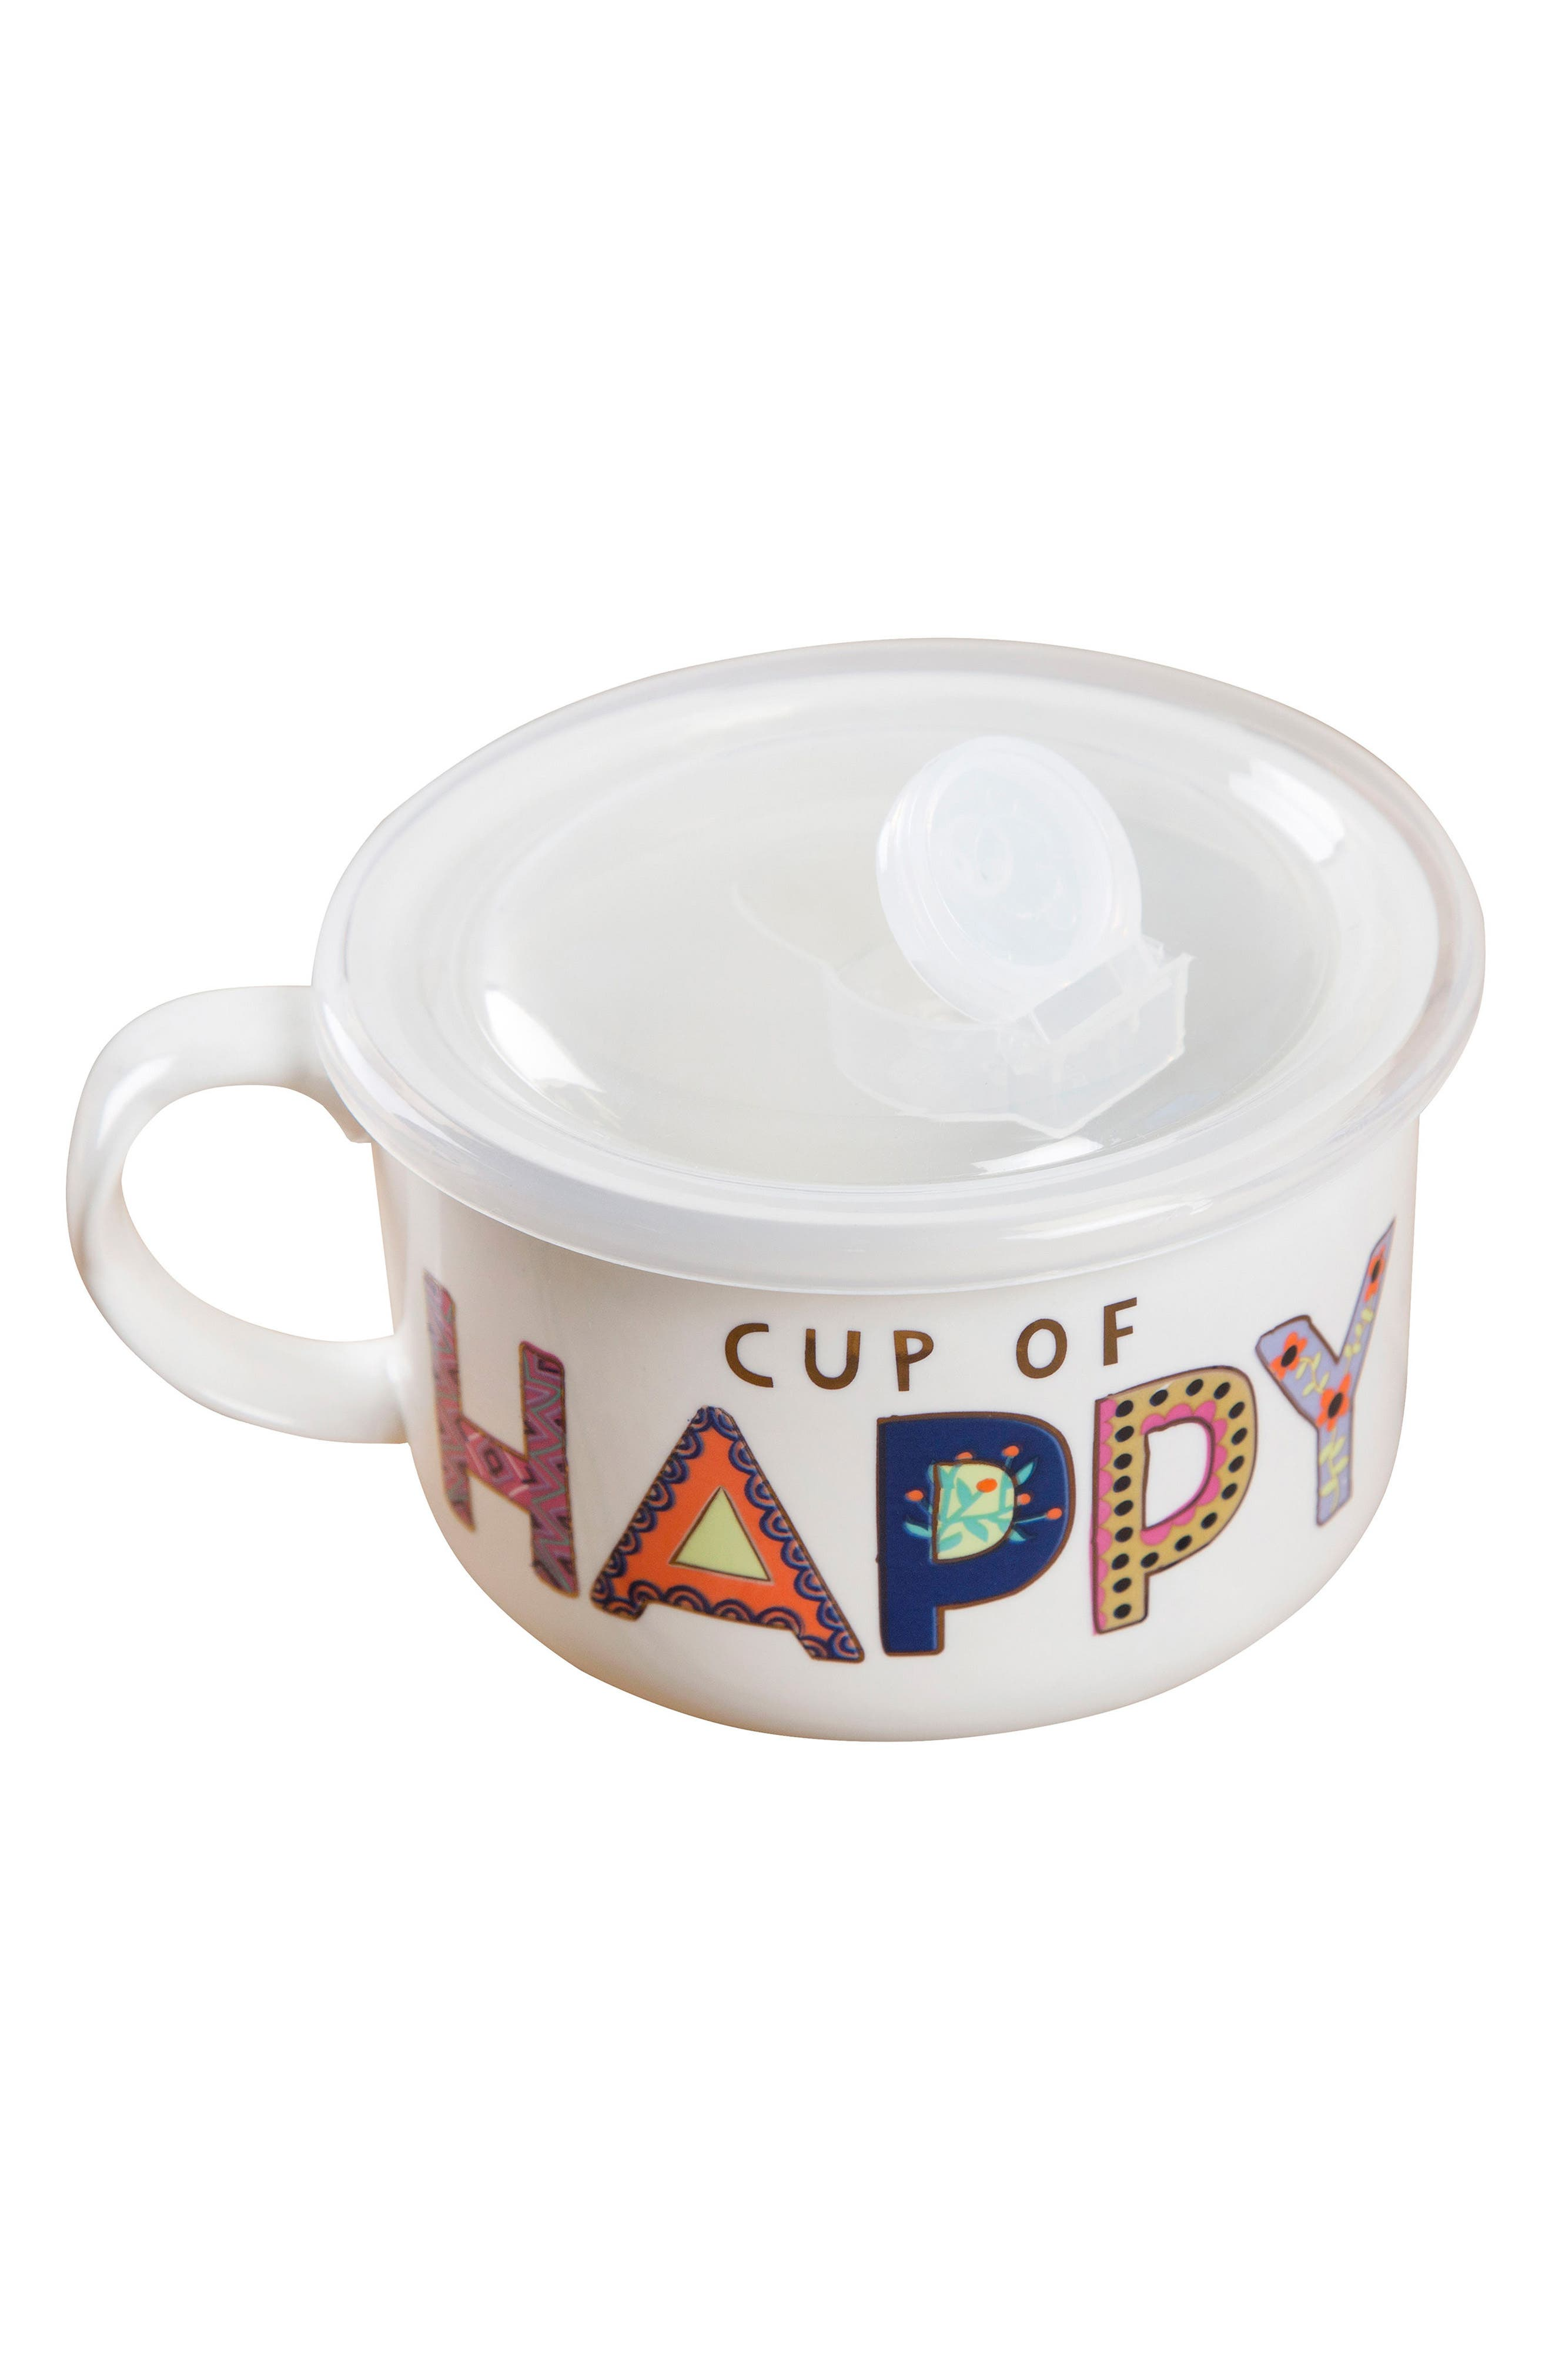 Main Image - Natural Life Cup of Happy Lidded Ceramic Soup Mug